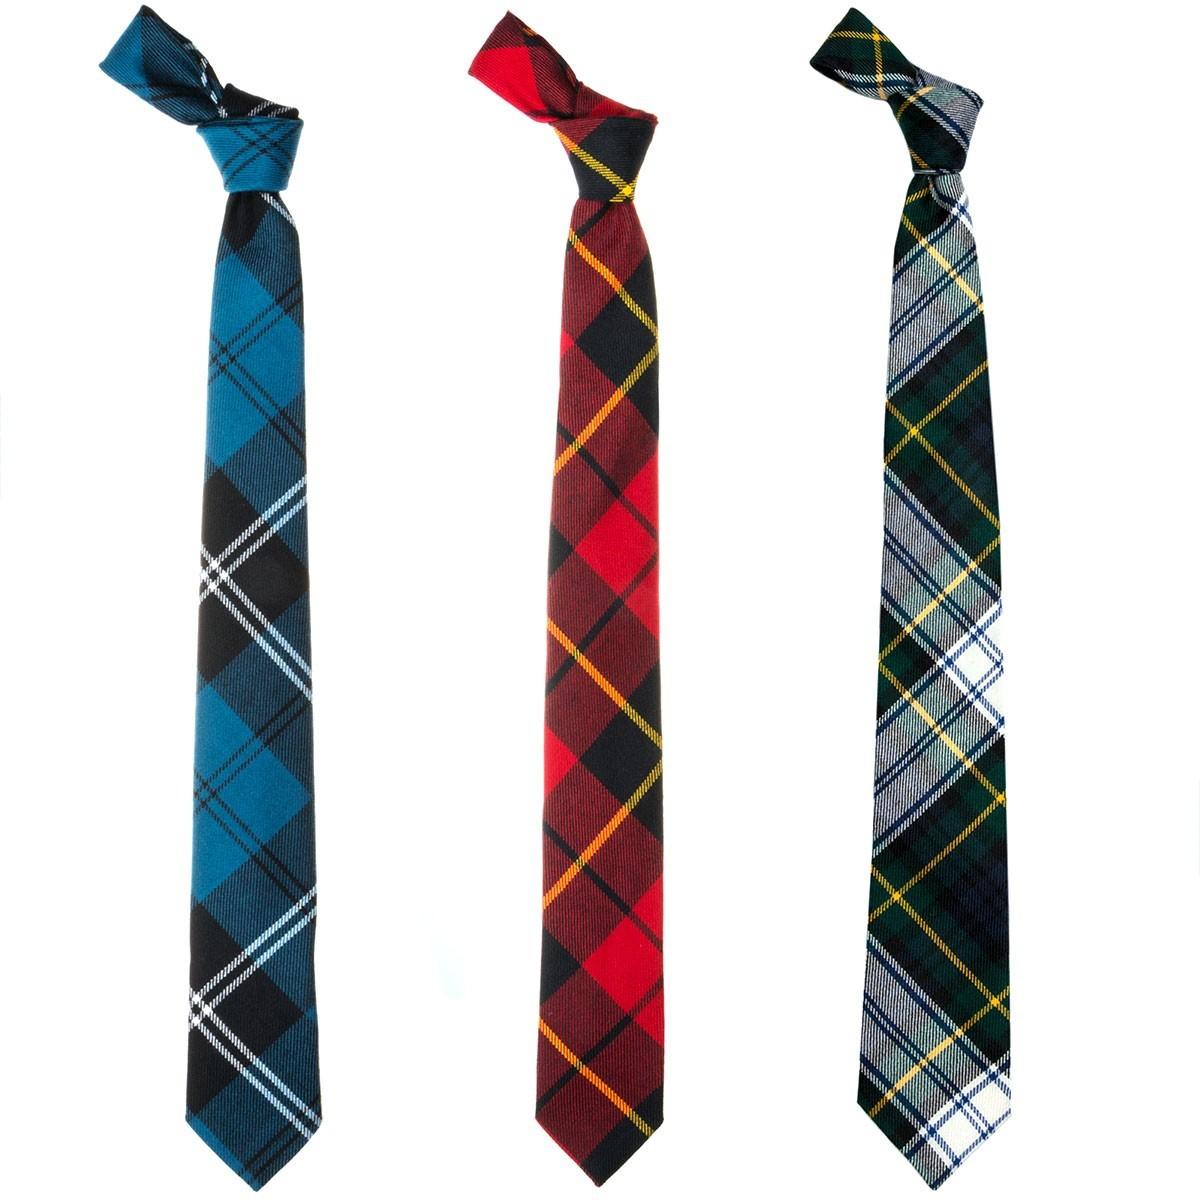 Bespoke Tartan Skinny Tie